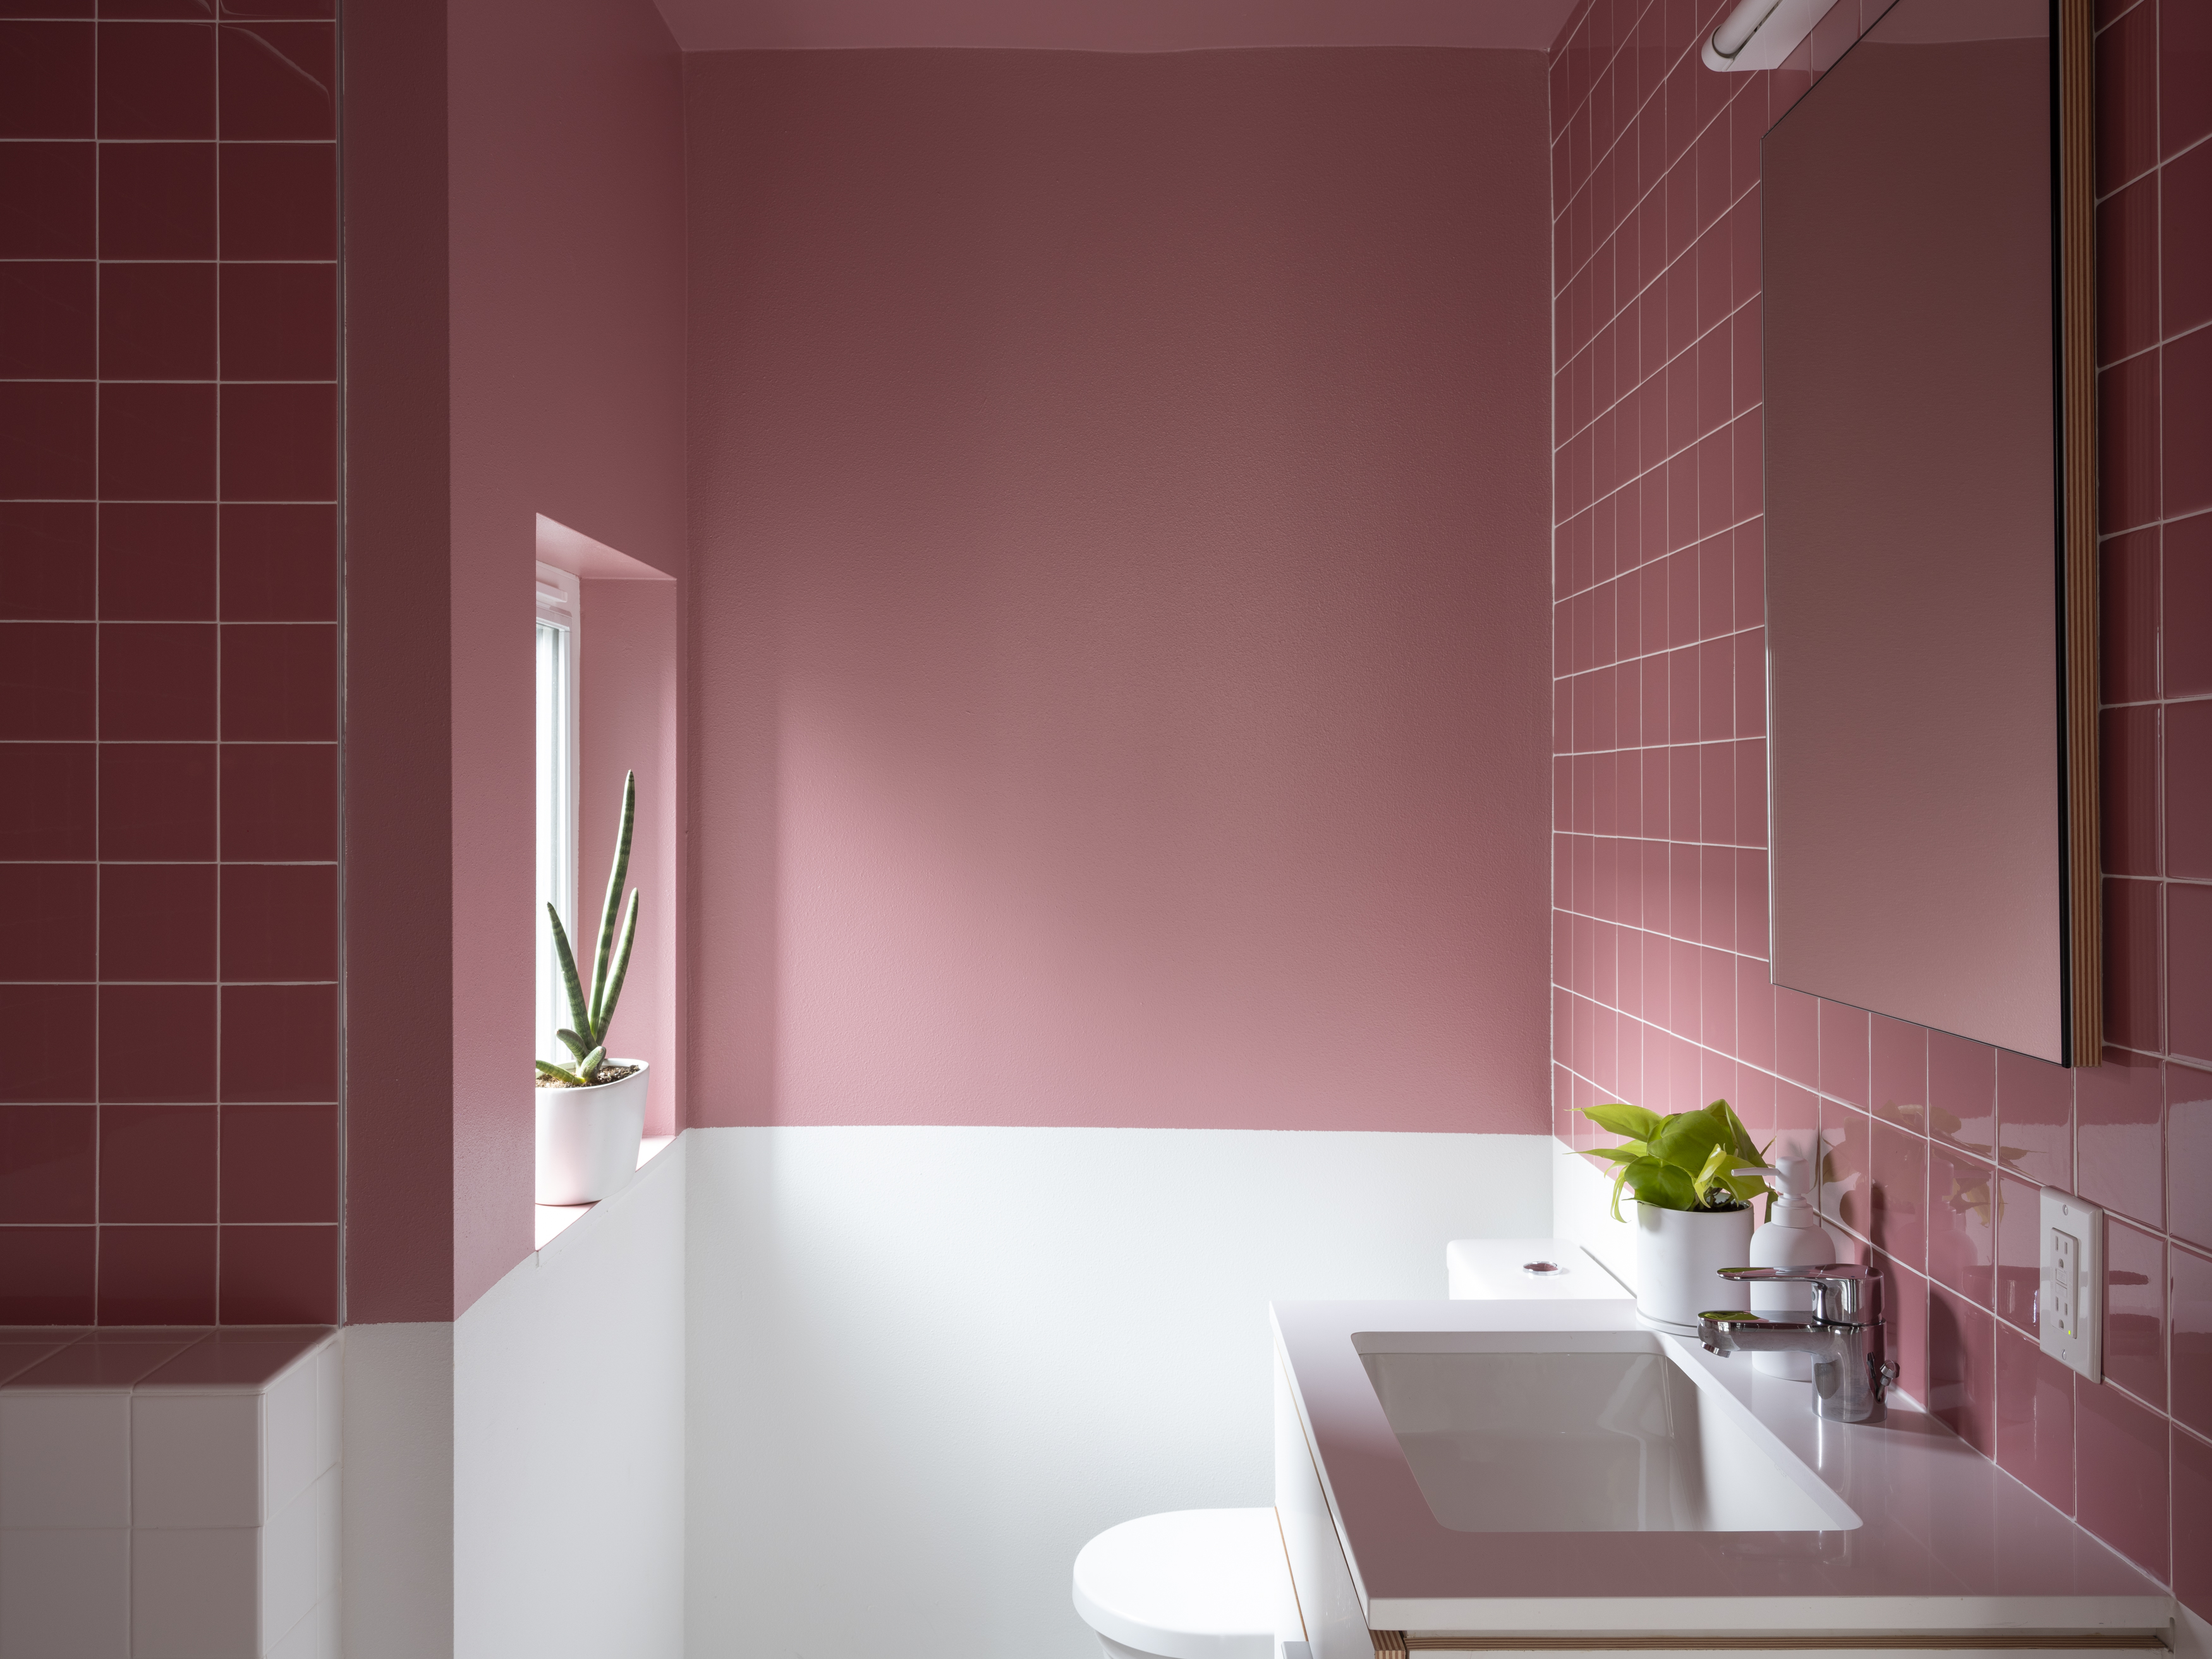 24 bathroom decor ideas for your next refresh